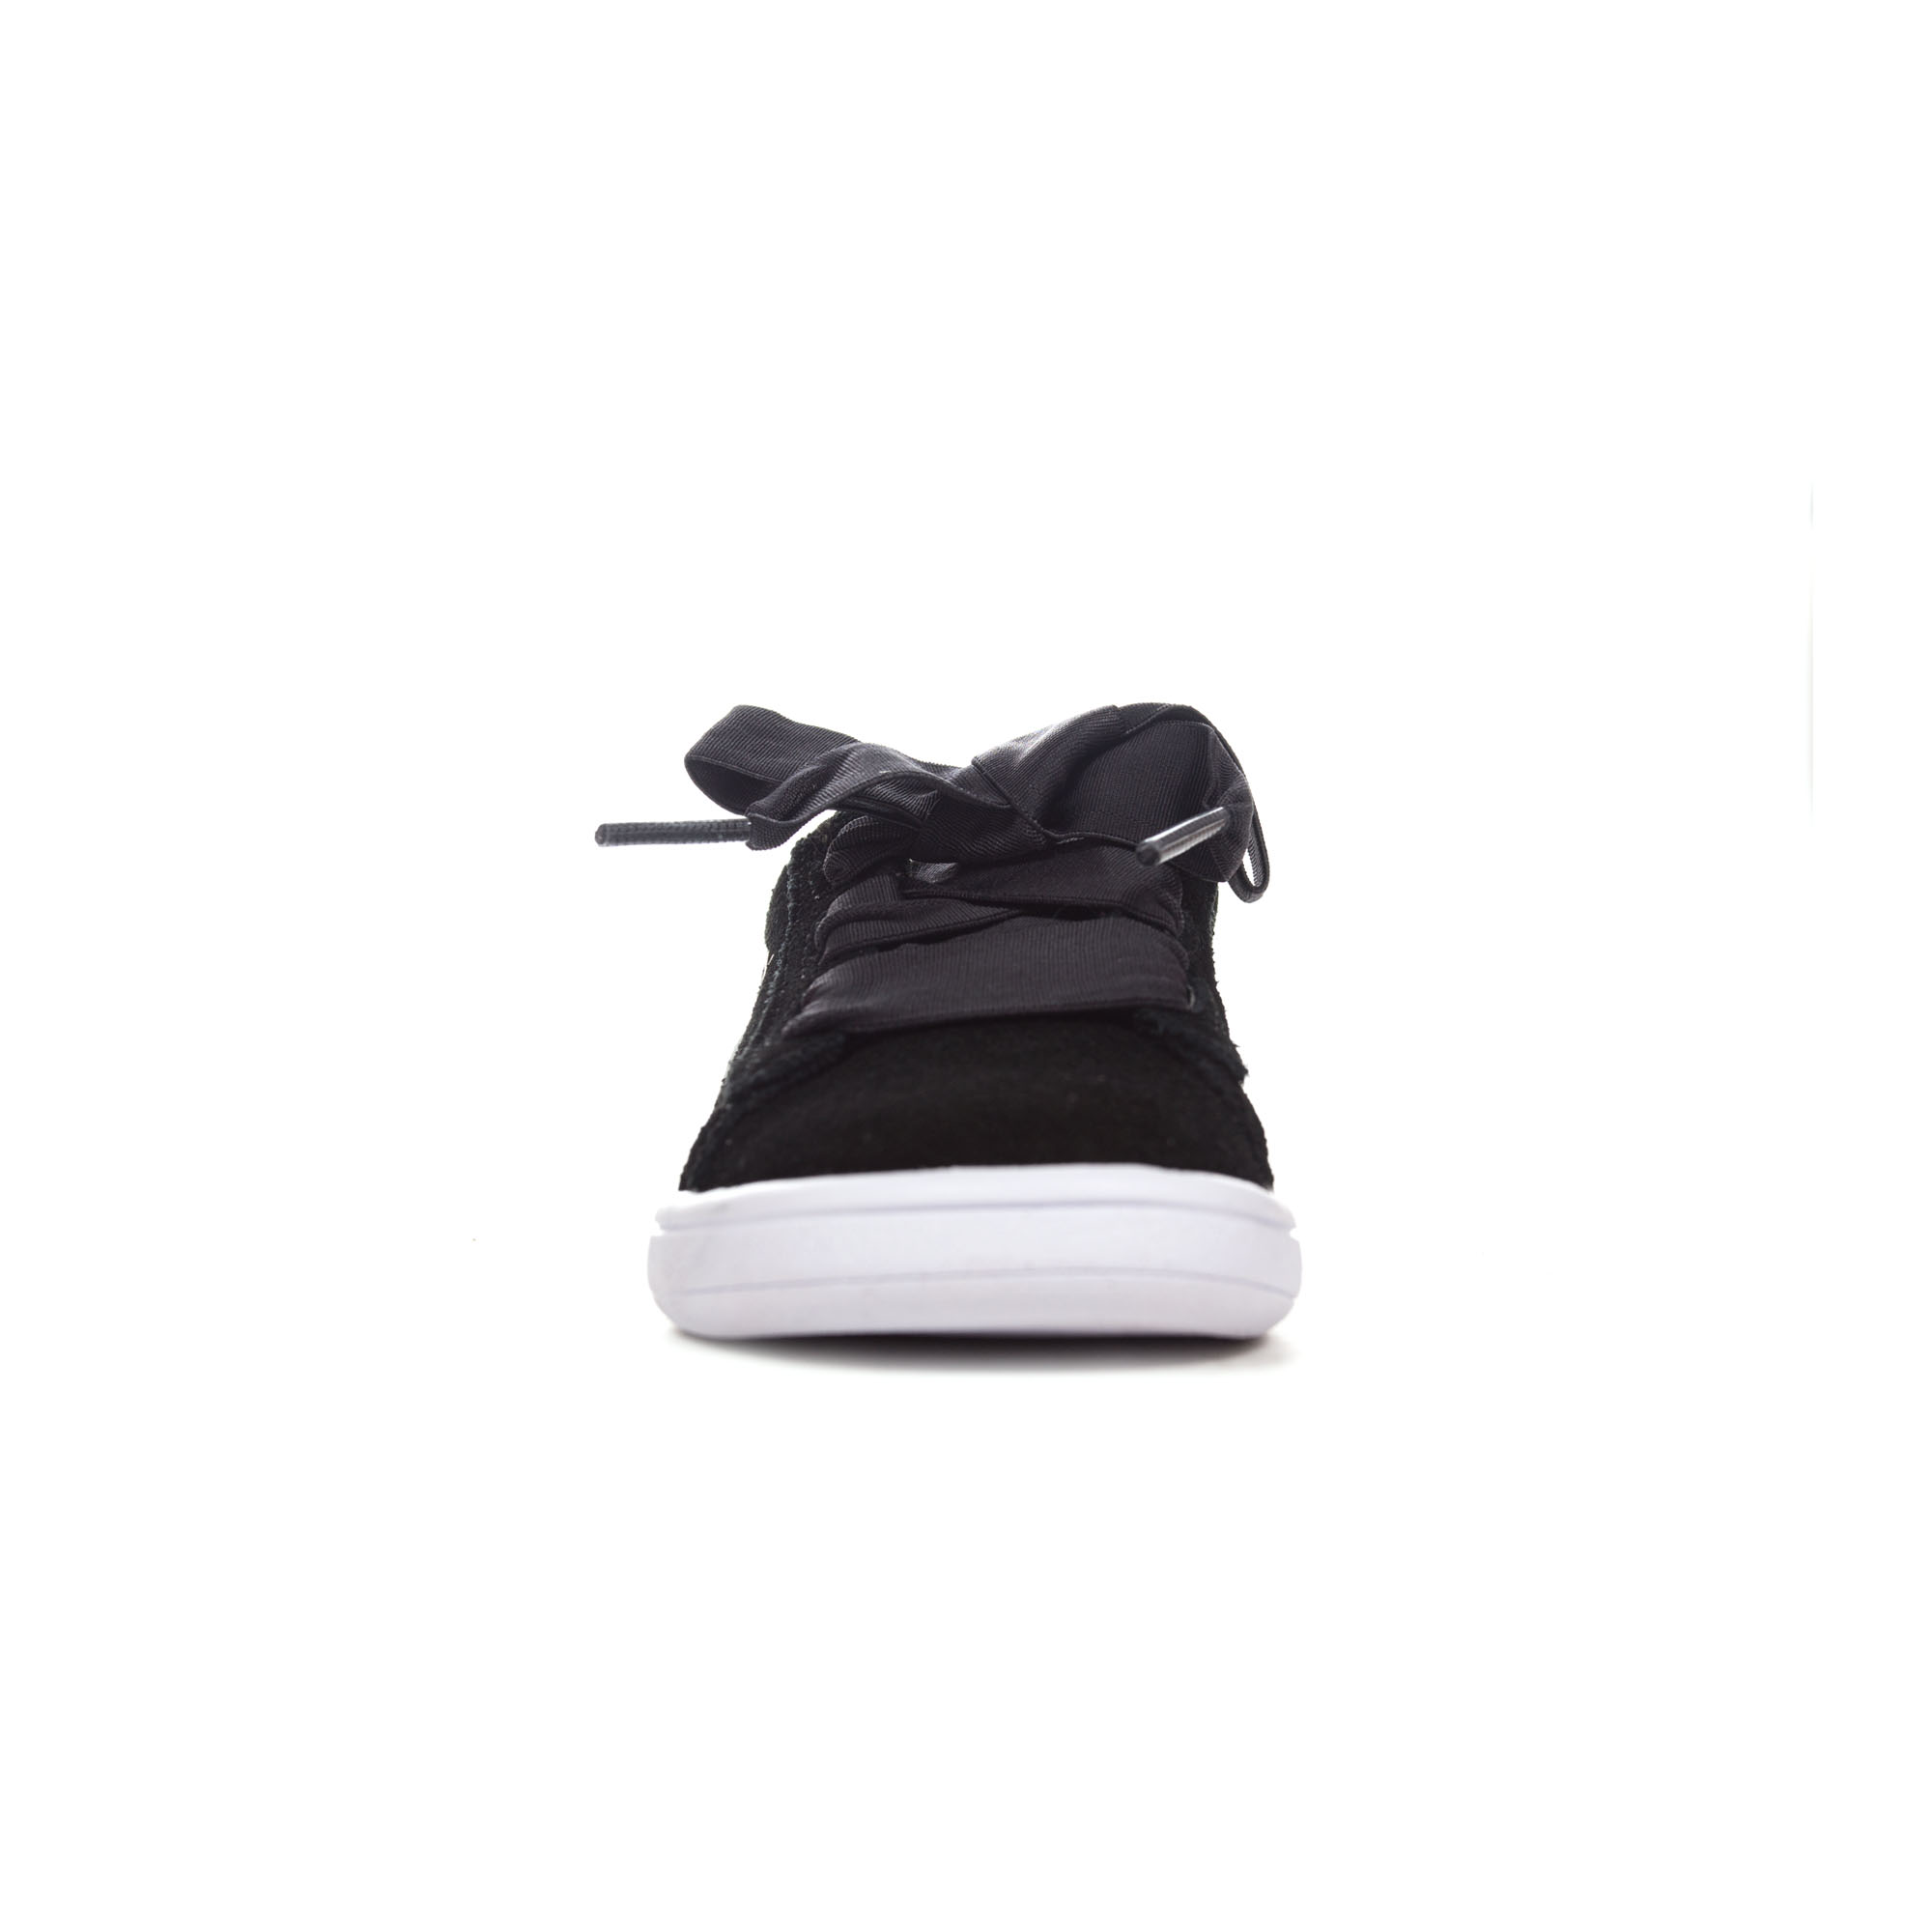 Details about Puma Smash V2 Ribbon Suede Infant Girls Trainer Shoe BlackWhite